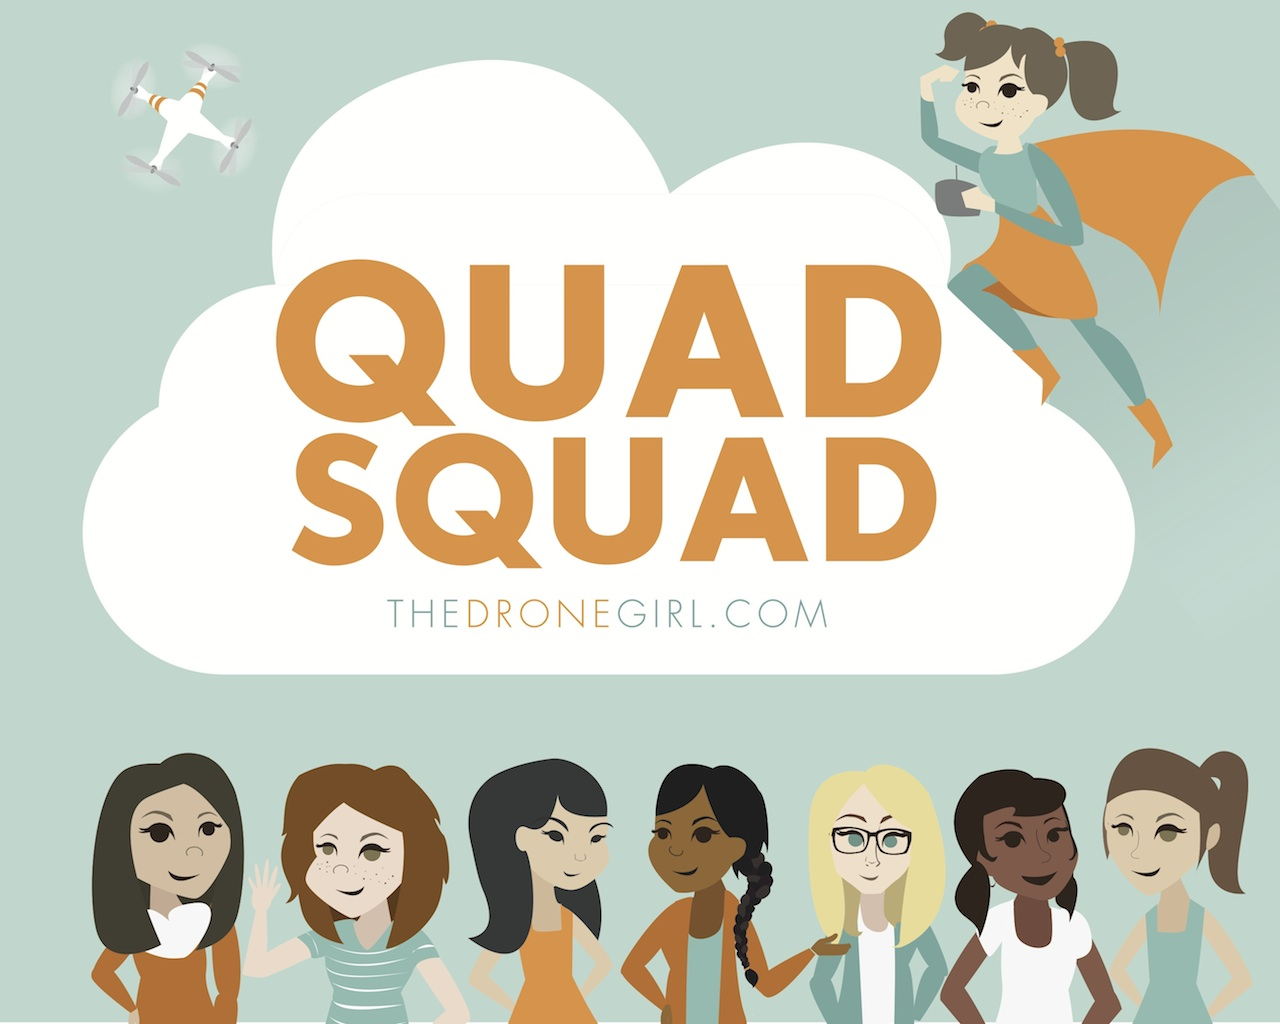 Drone Girl Art Series: Quad Squad